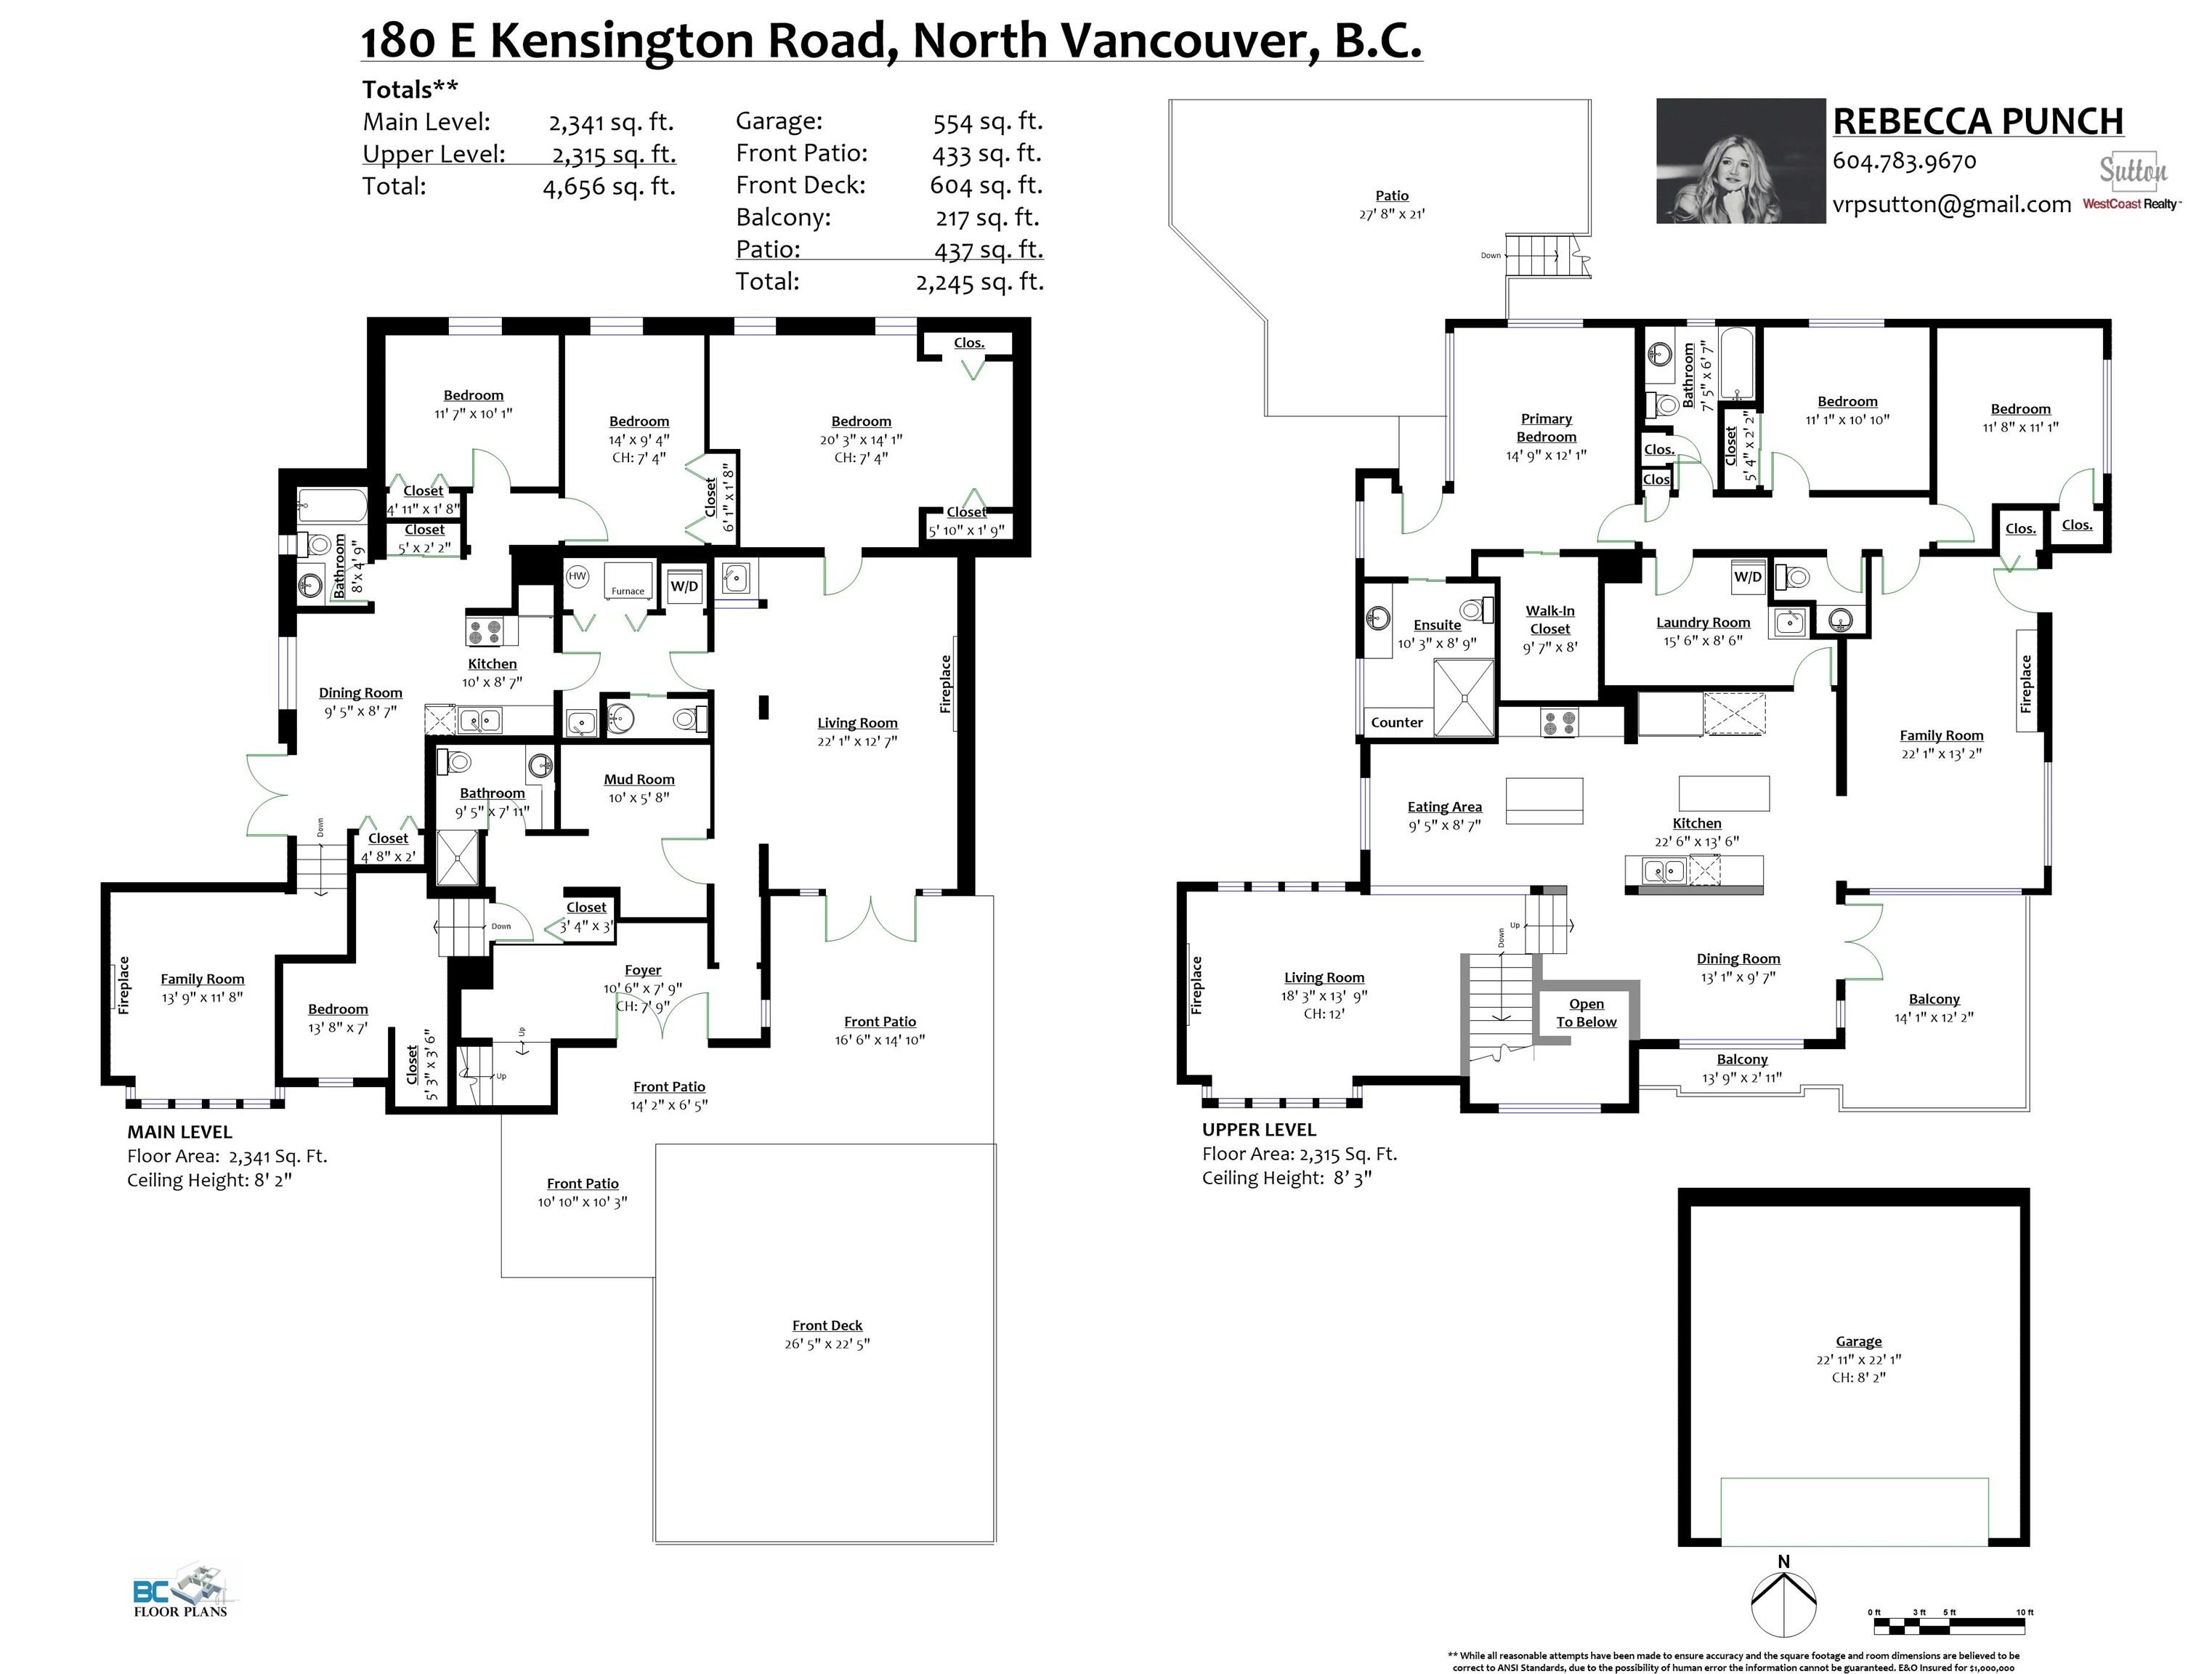 Listing image of 180 E KENSINGTON ROAD